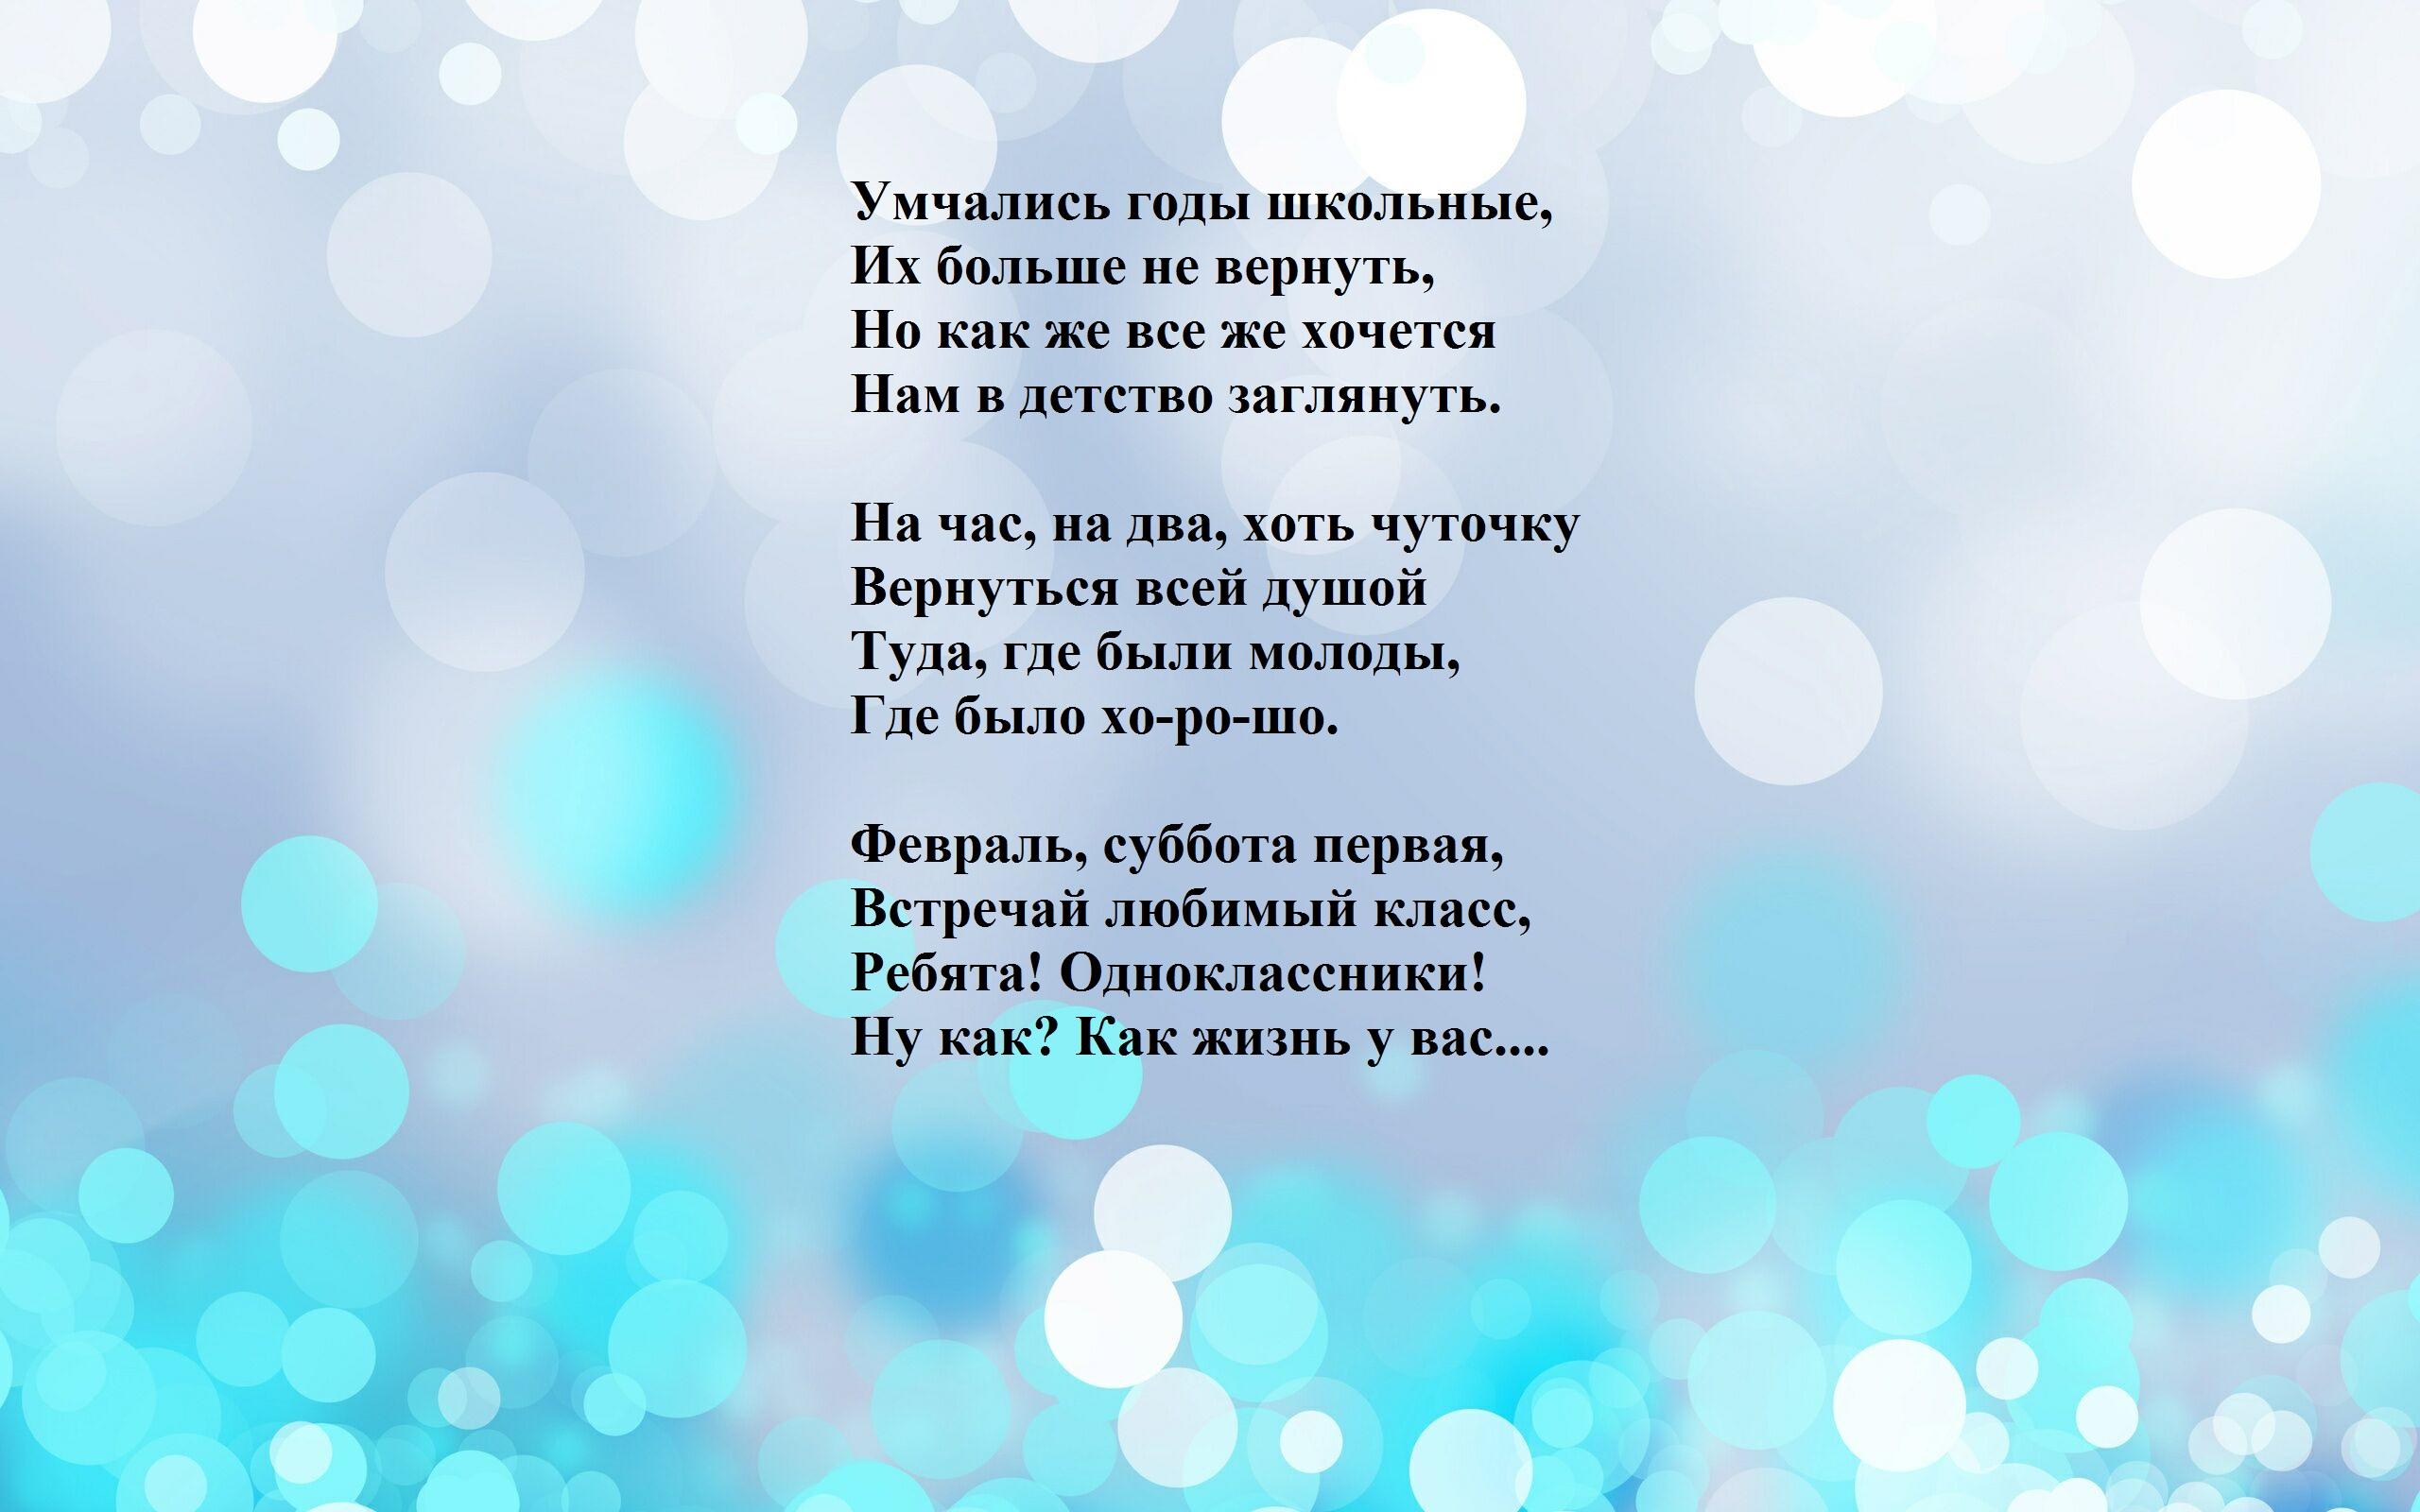 стихи для встречи друзей внизу под досками